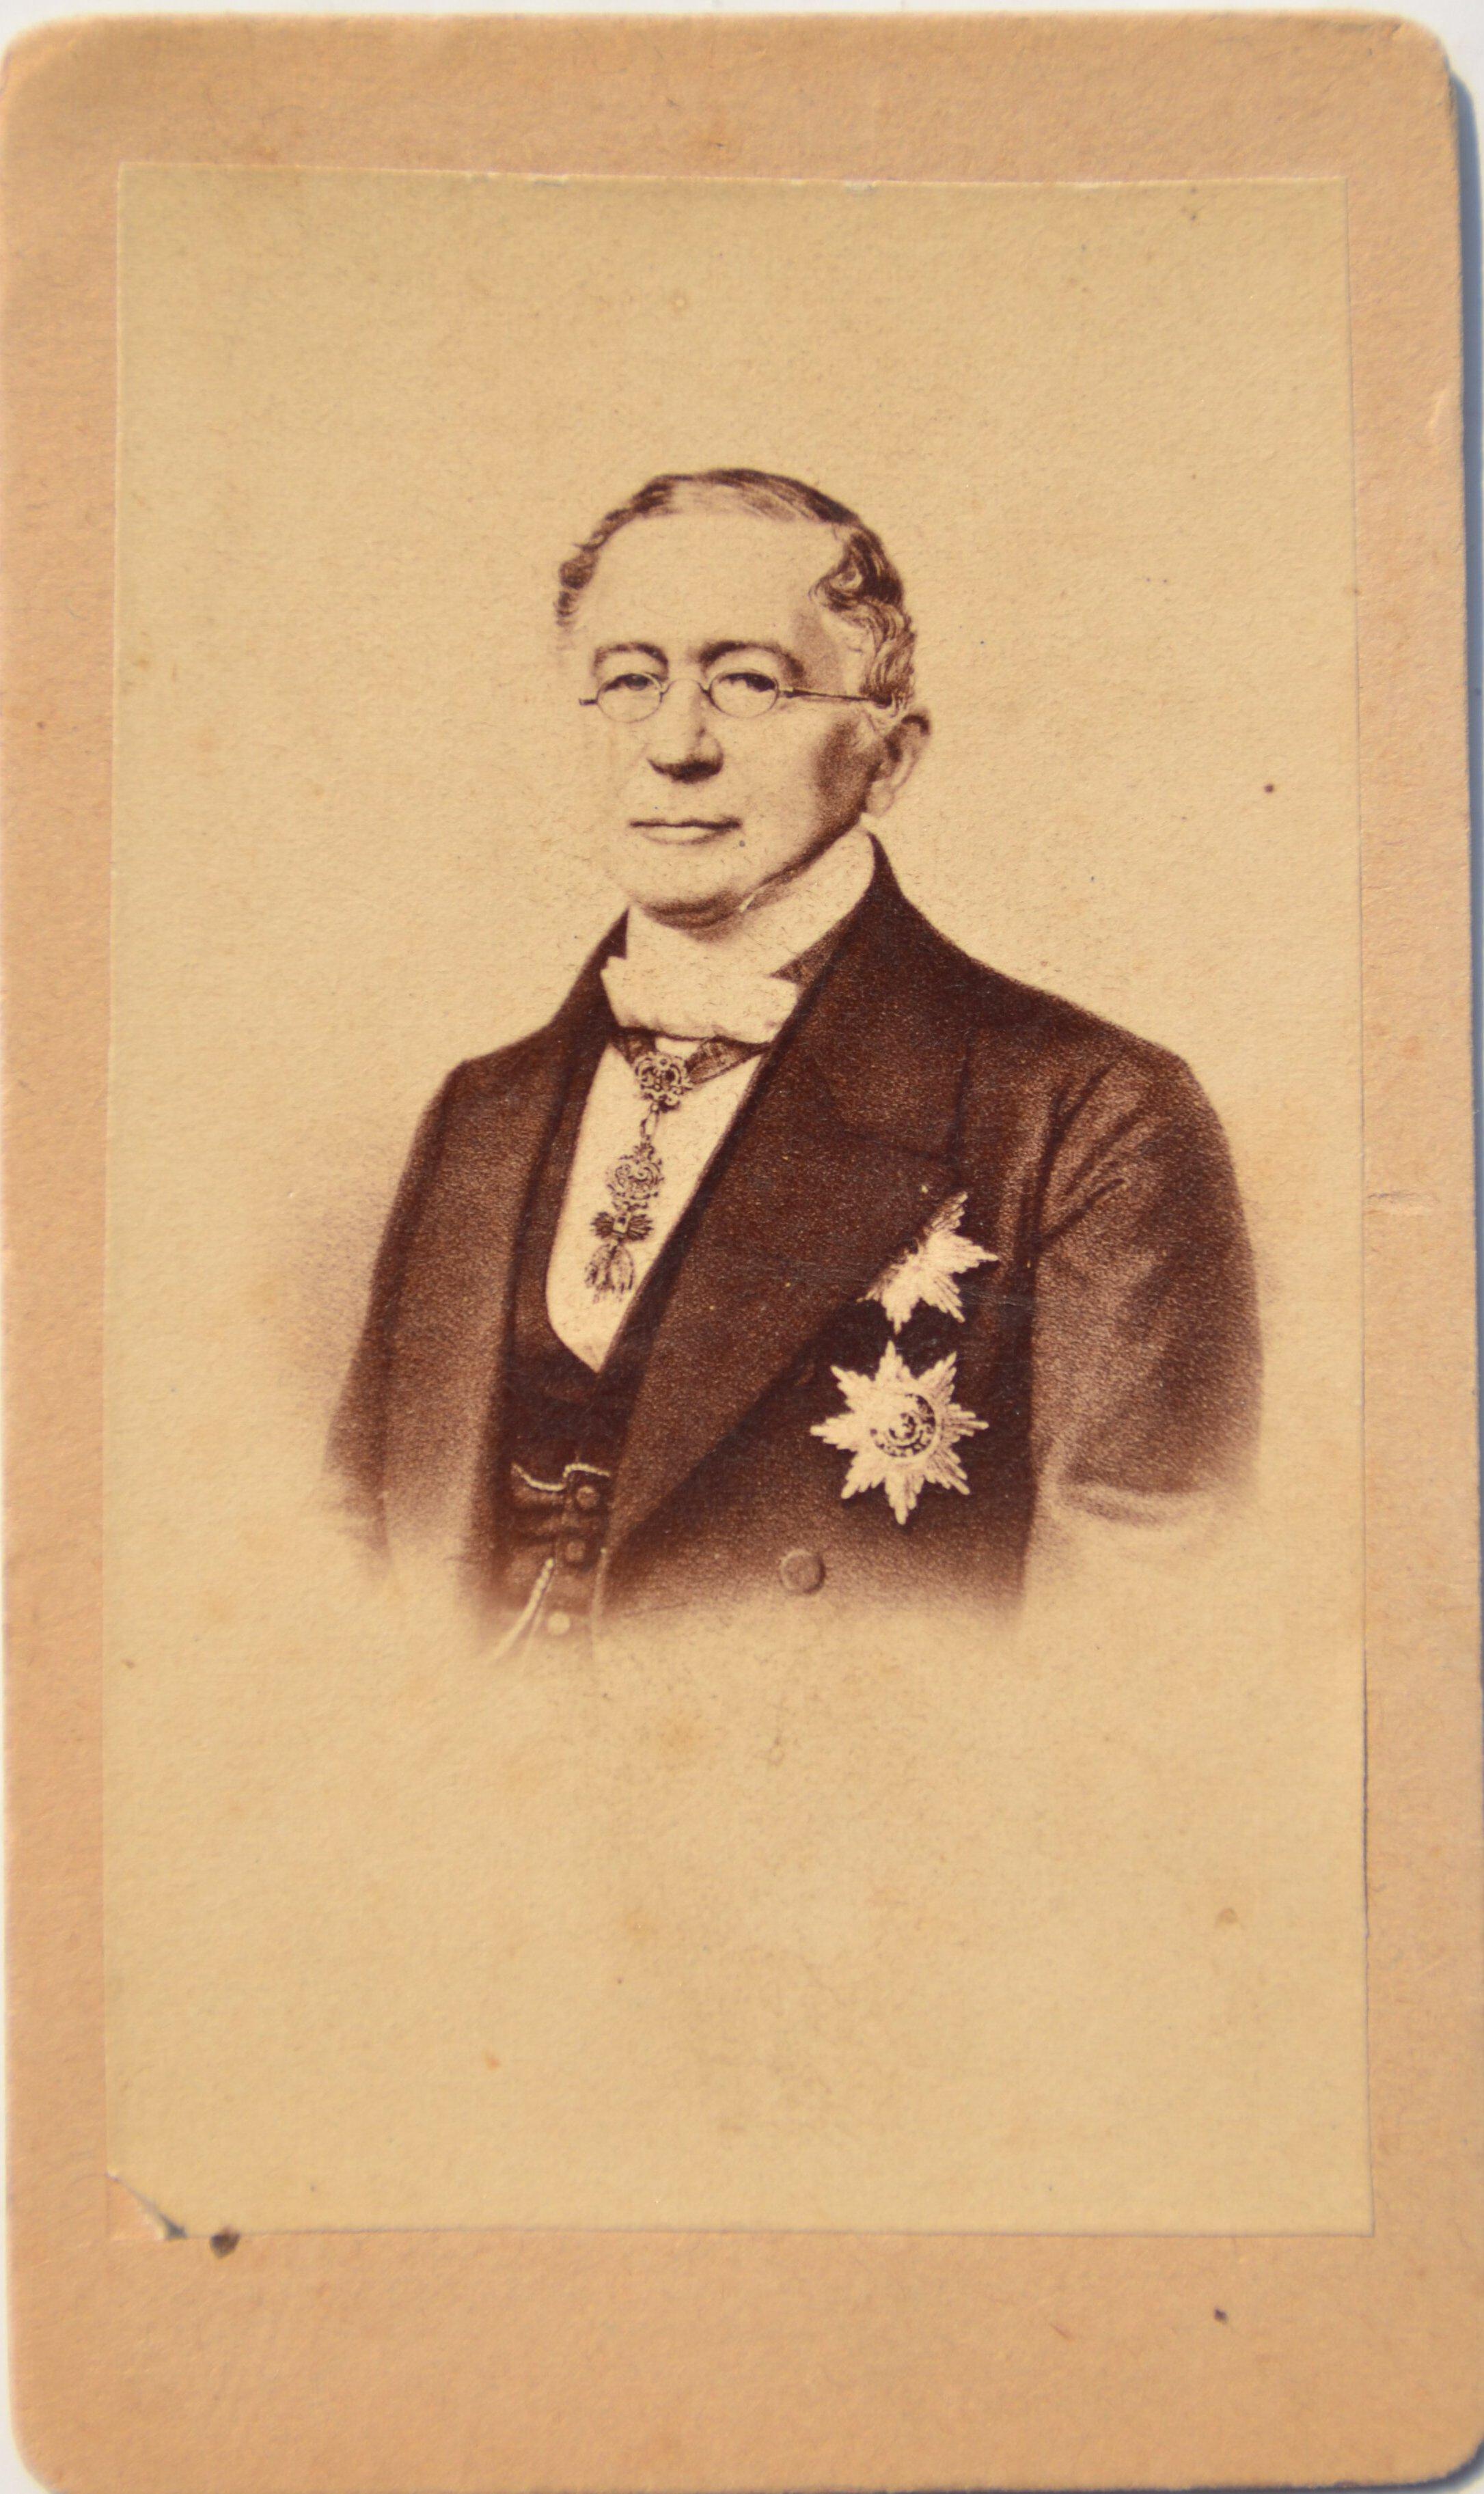 Светлейший князь Горчаков Александр Михайлович